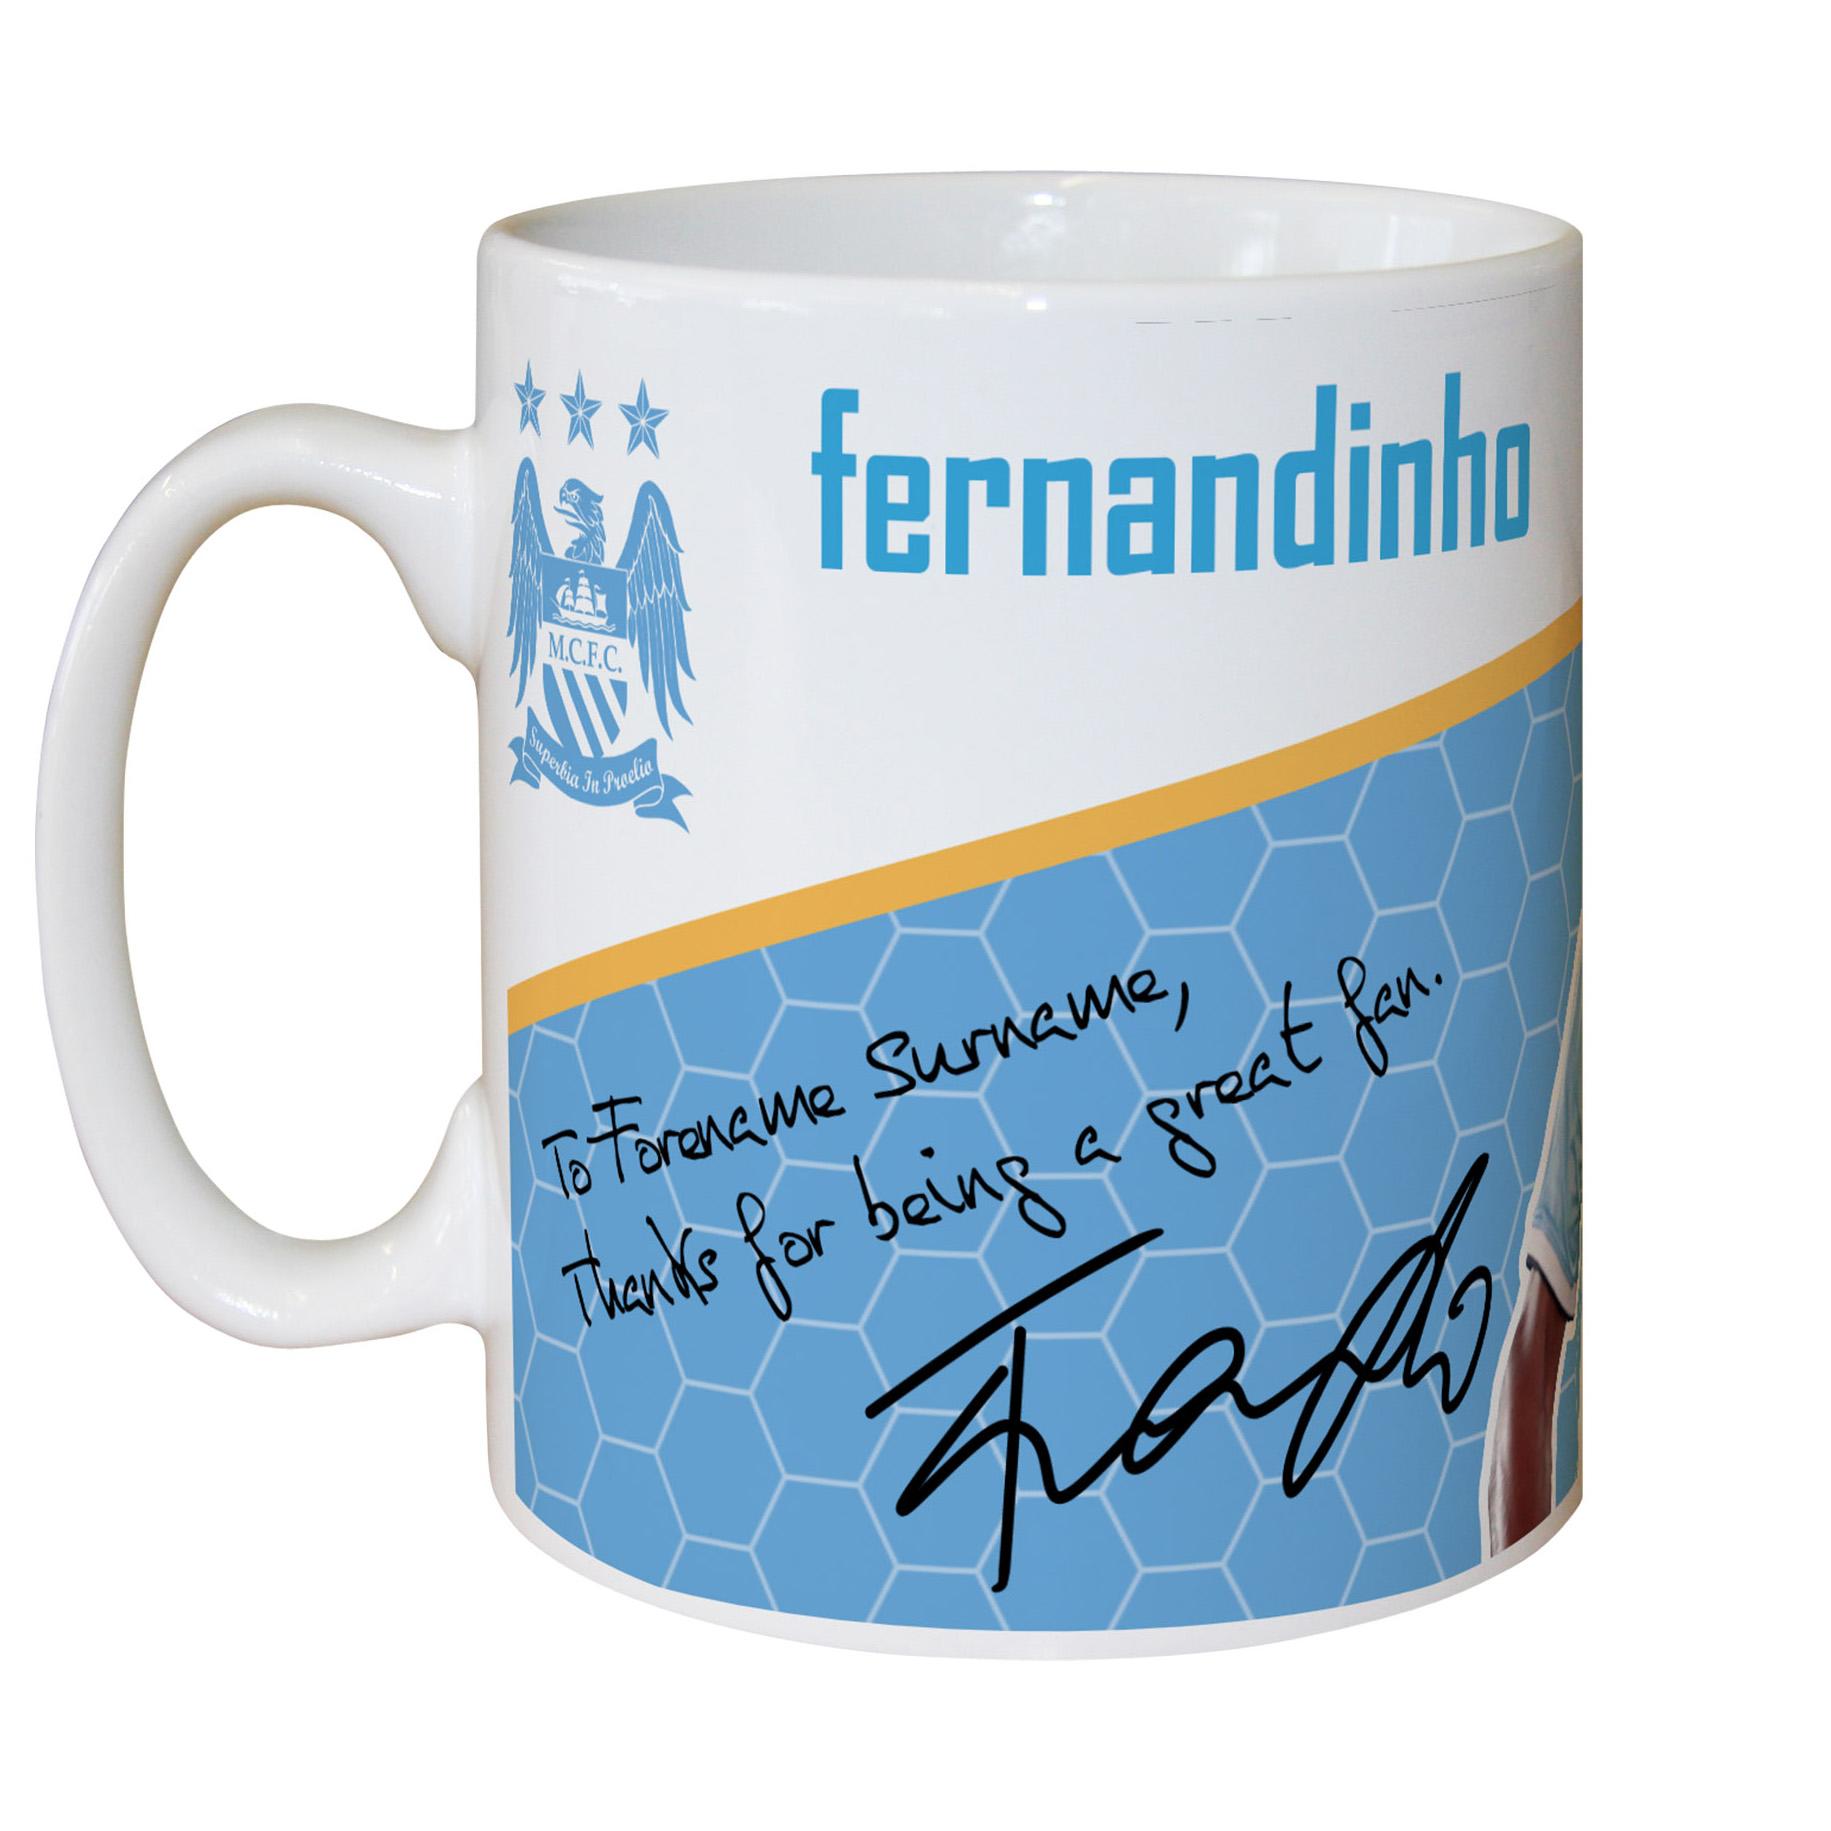 Manchester City Personalised Swirl Signature Mug - Fernandinho